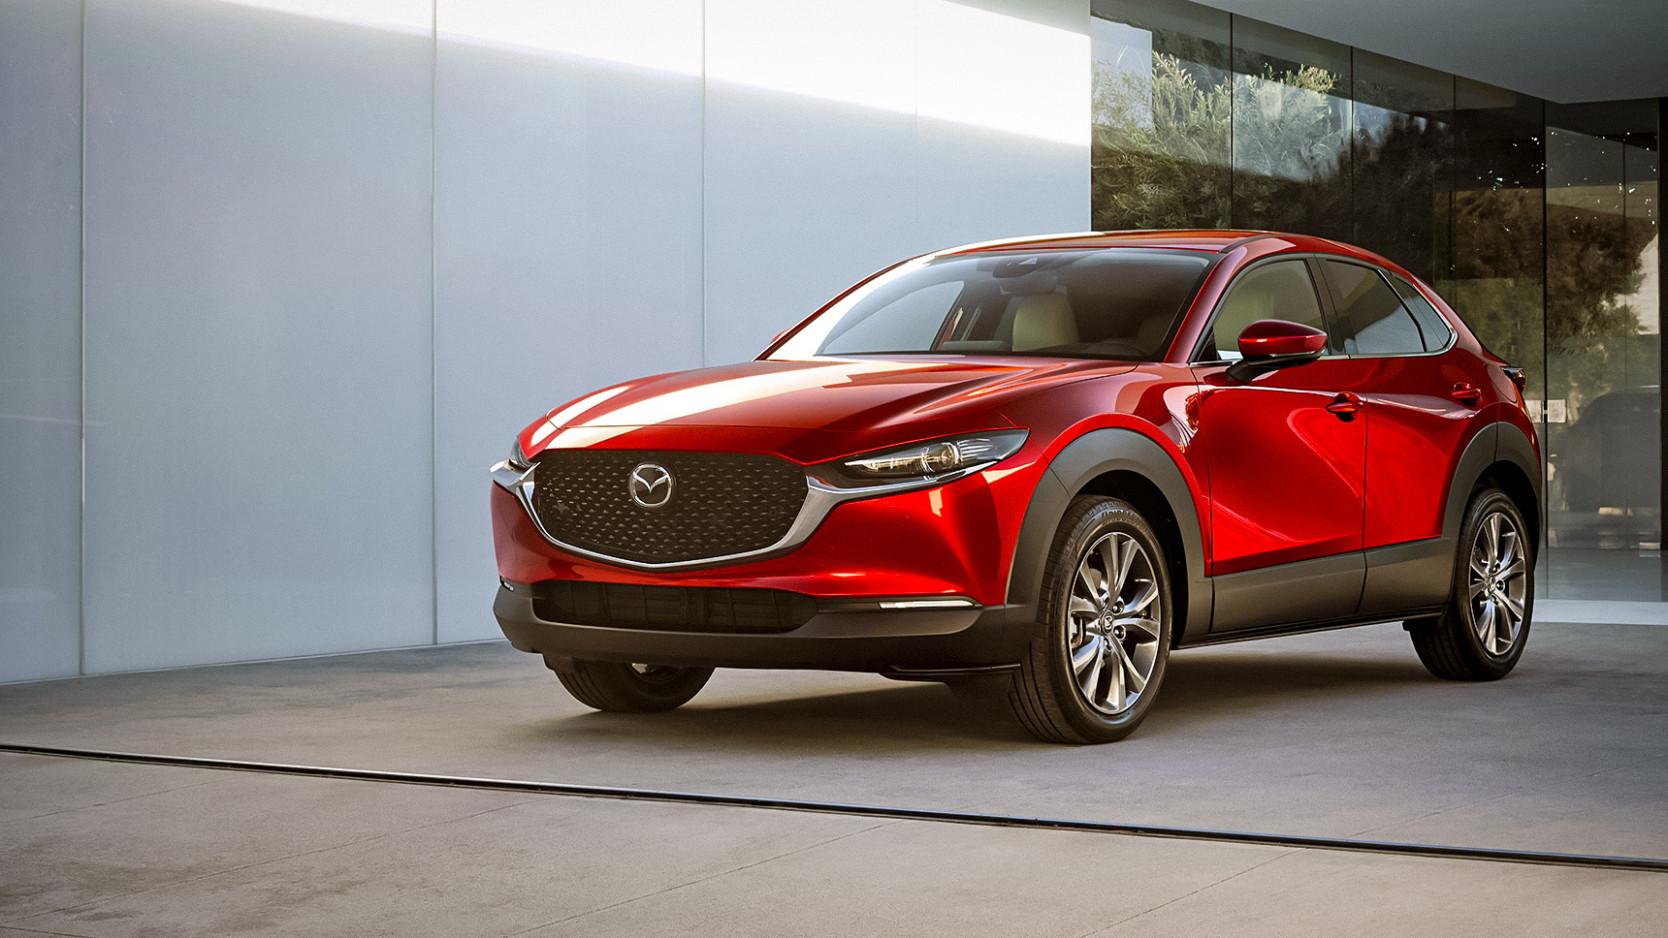 Ratings 2022 Mazda Cx 9